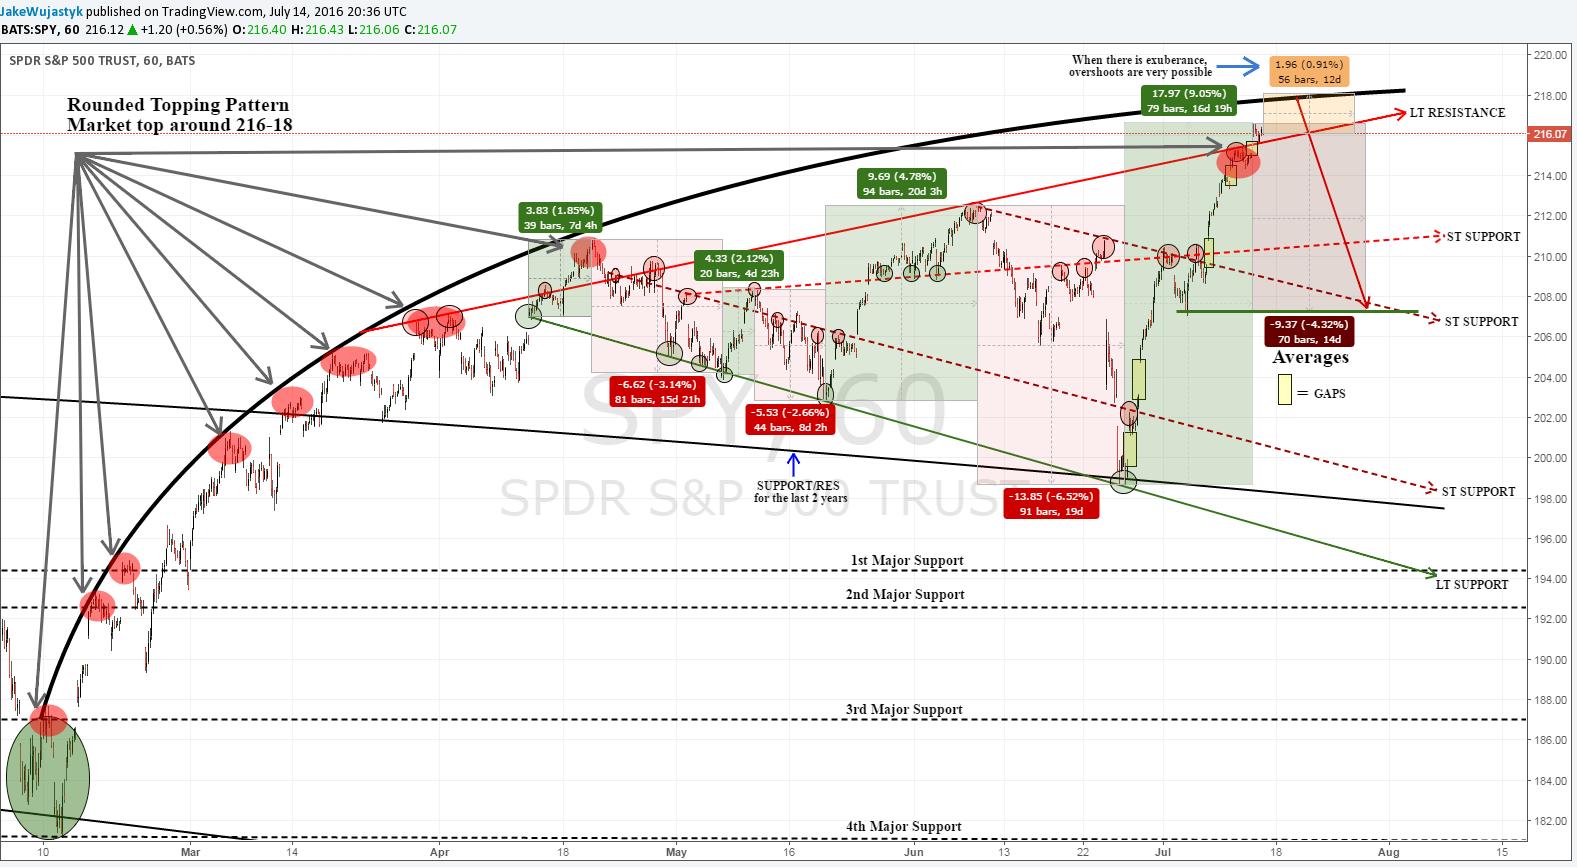 Predicting the stock market